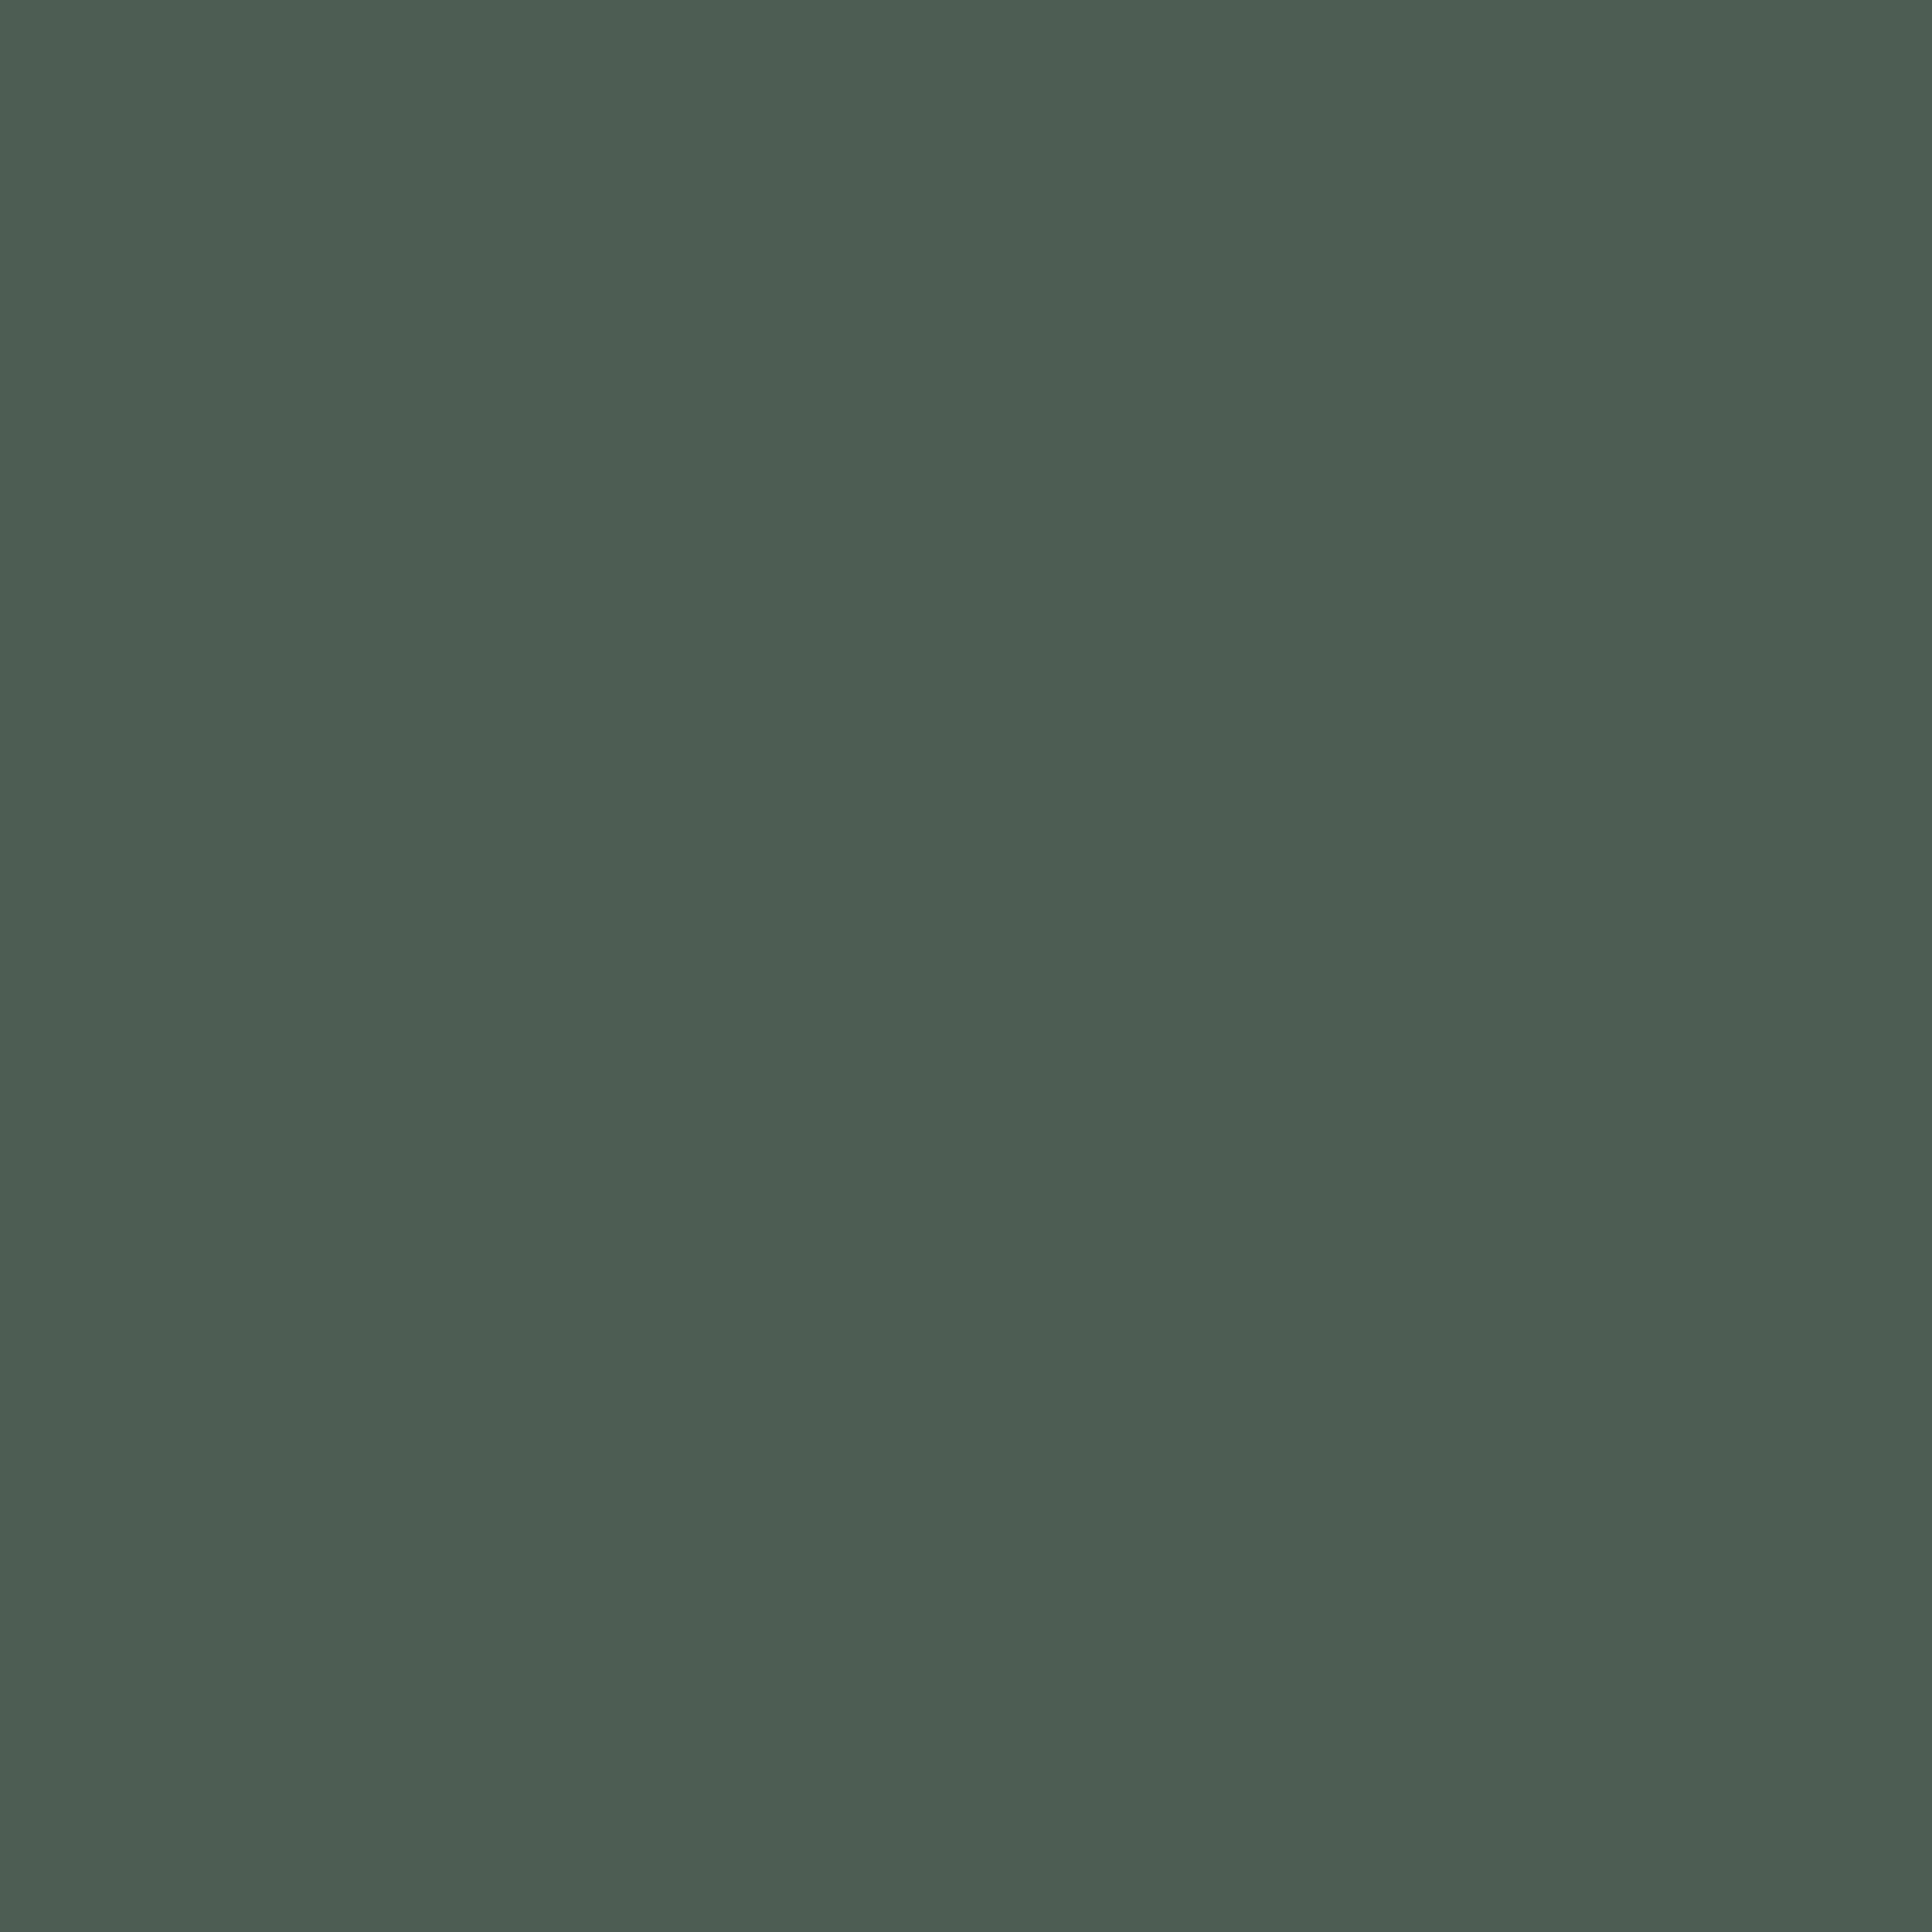 2048x2048 Feldgrau Solid Color Background